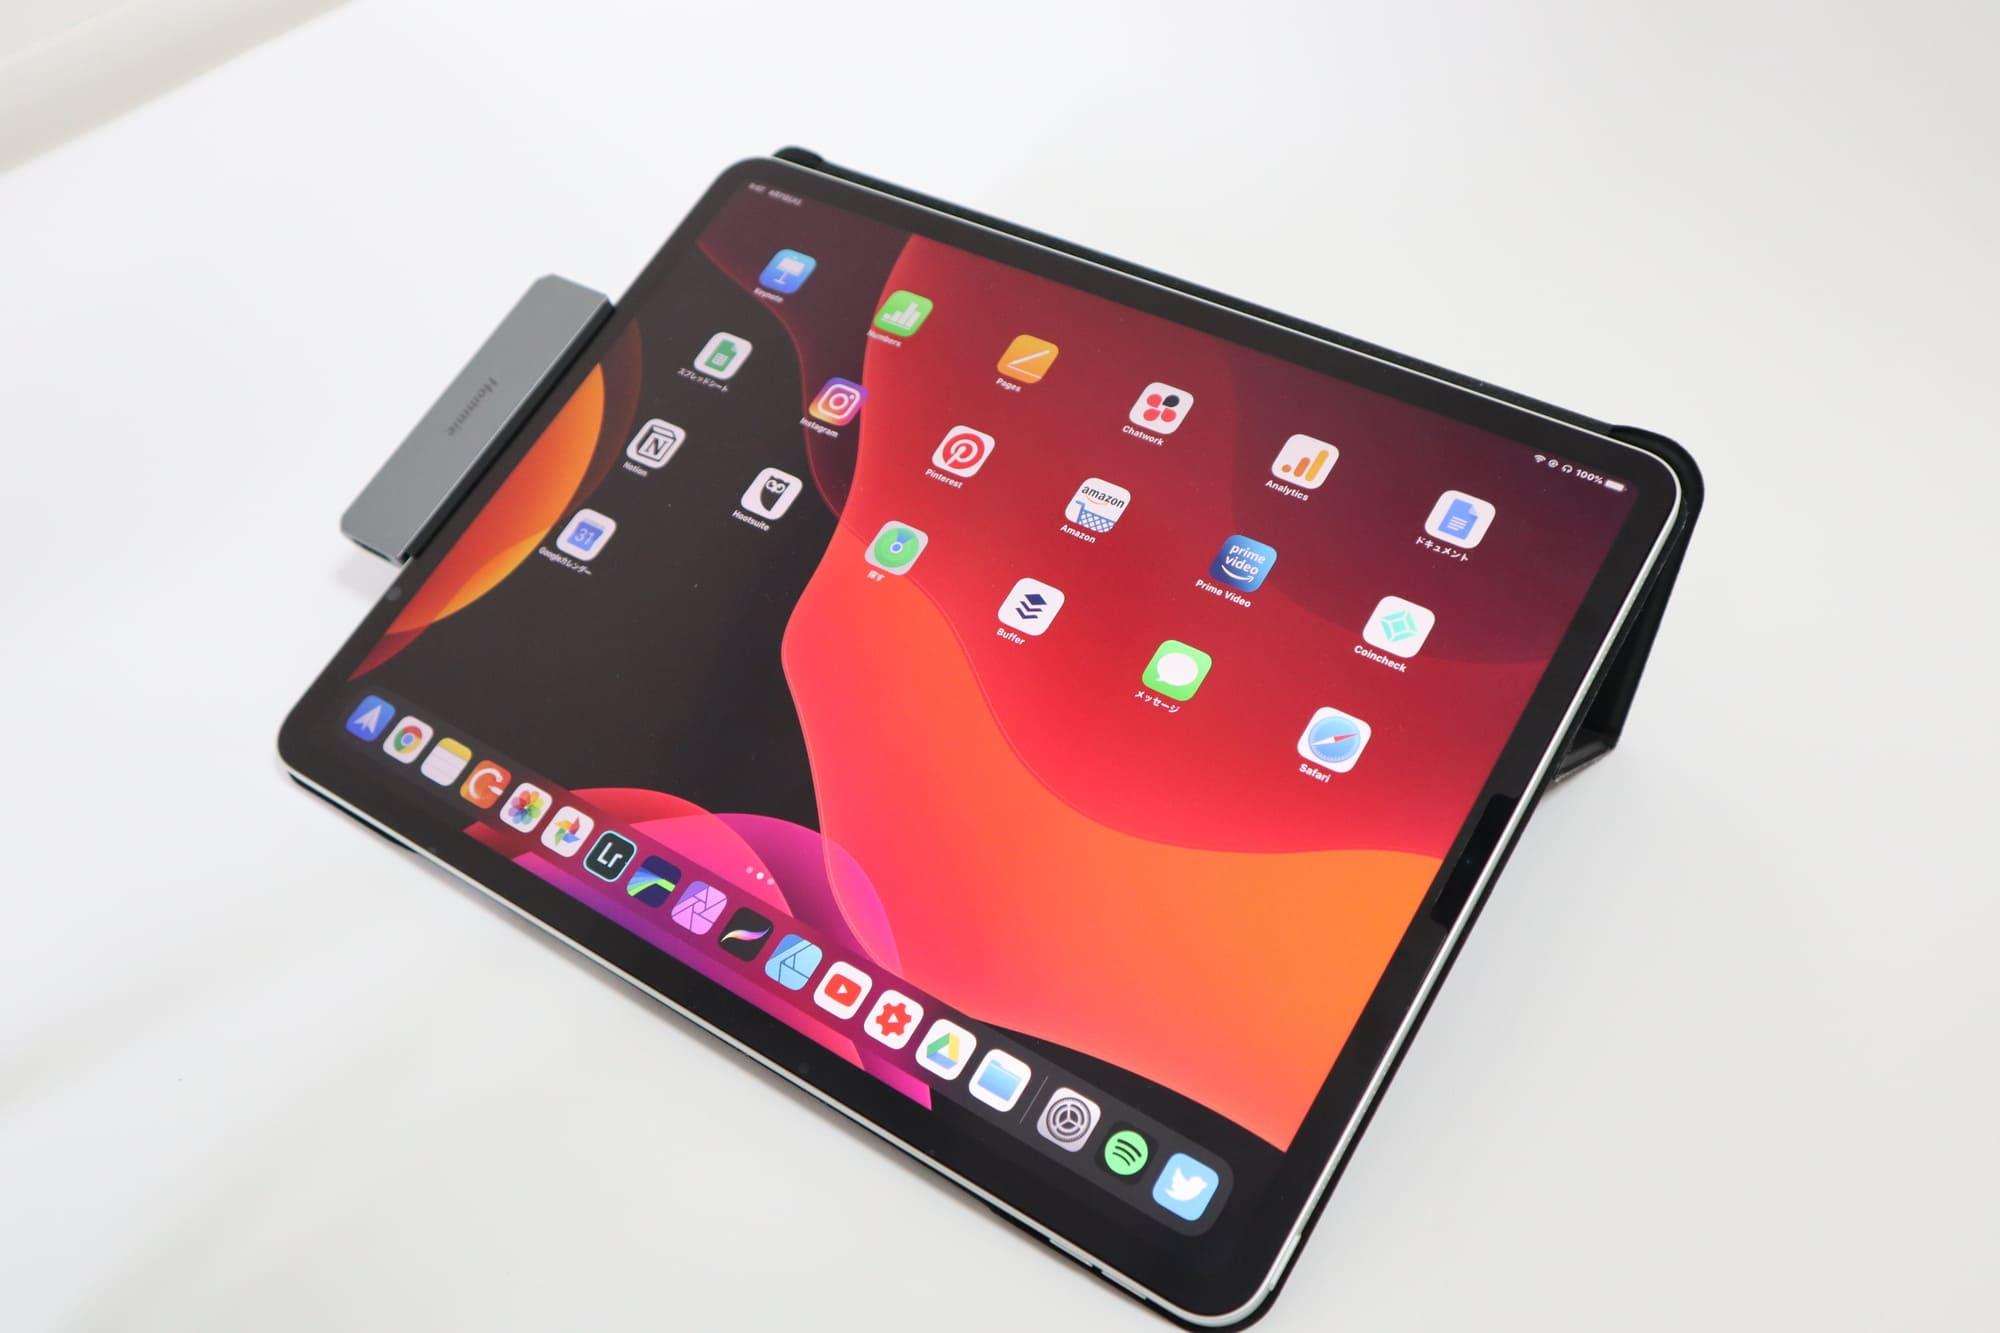 iPadとHommie Type-C モバイル ハブ ドッキングステーションの接続